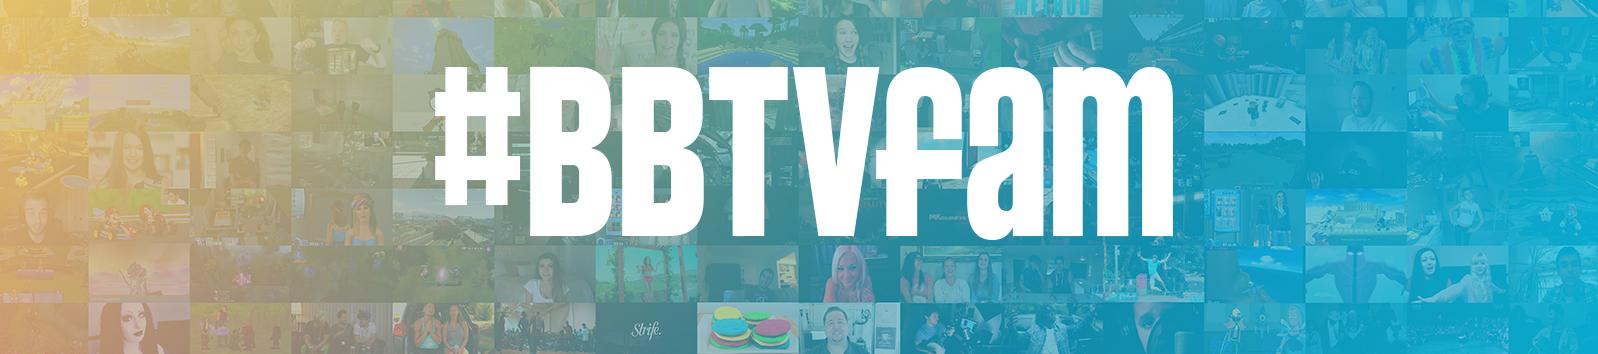 BBTVfam